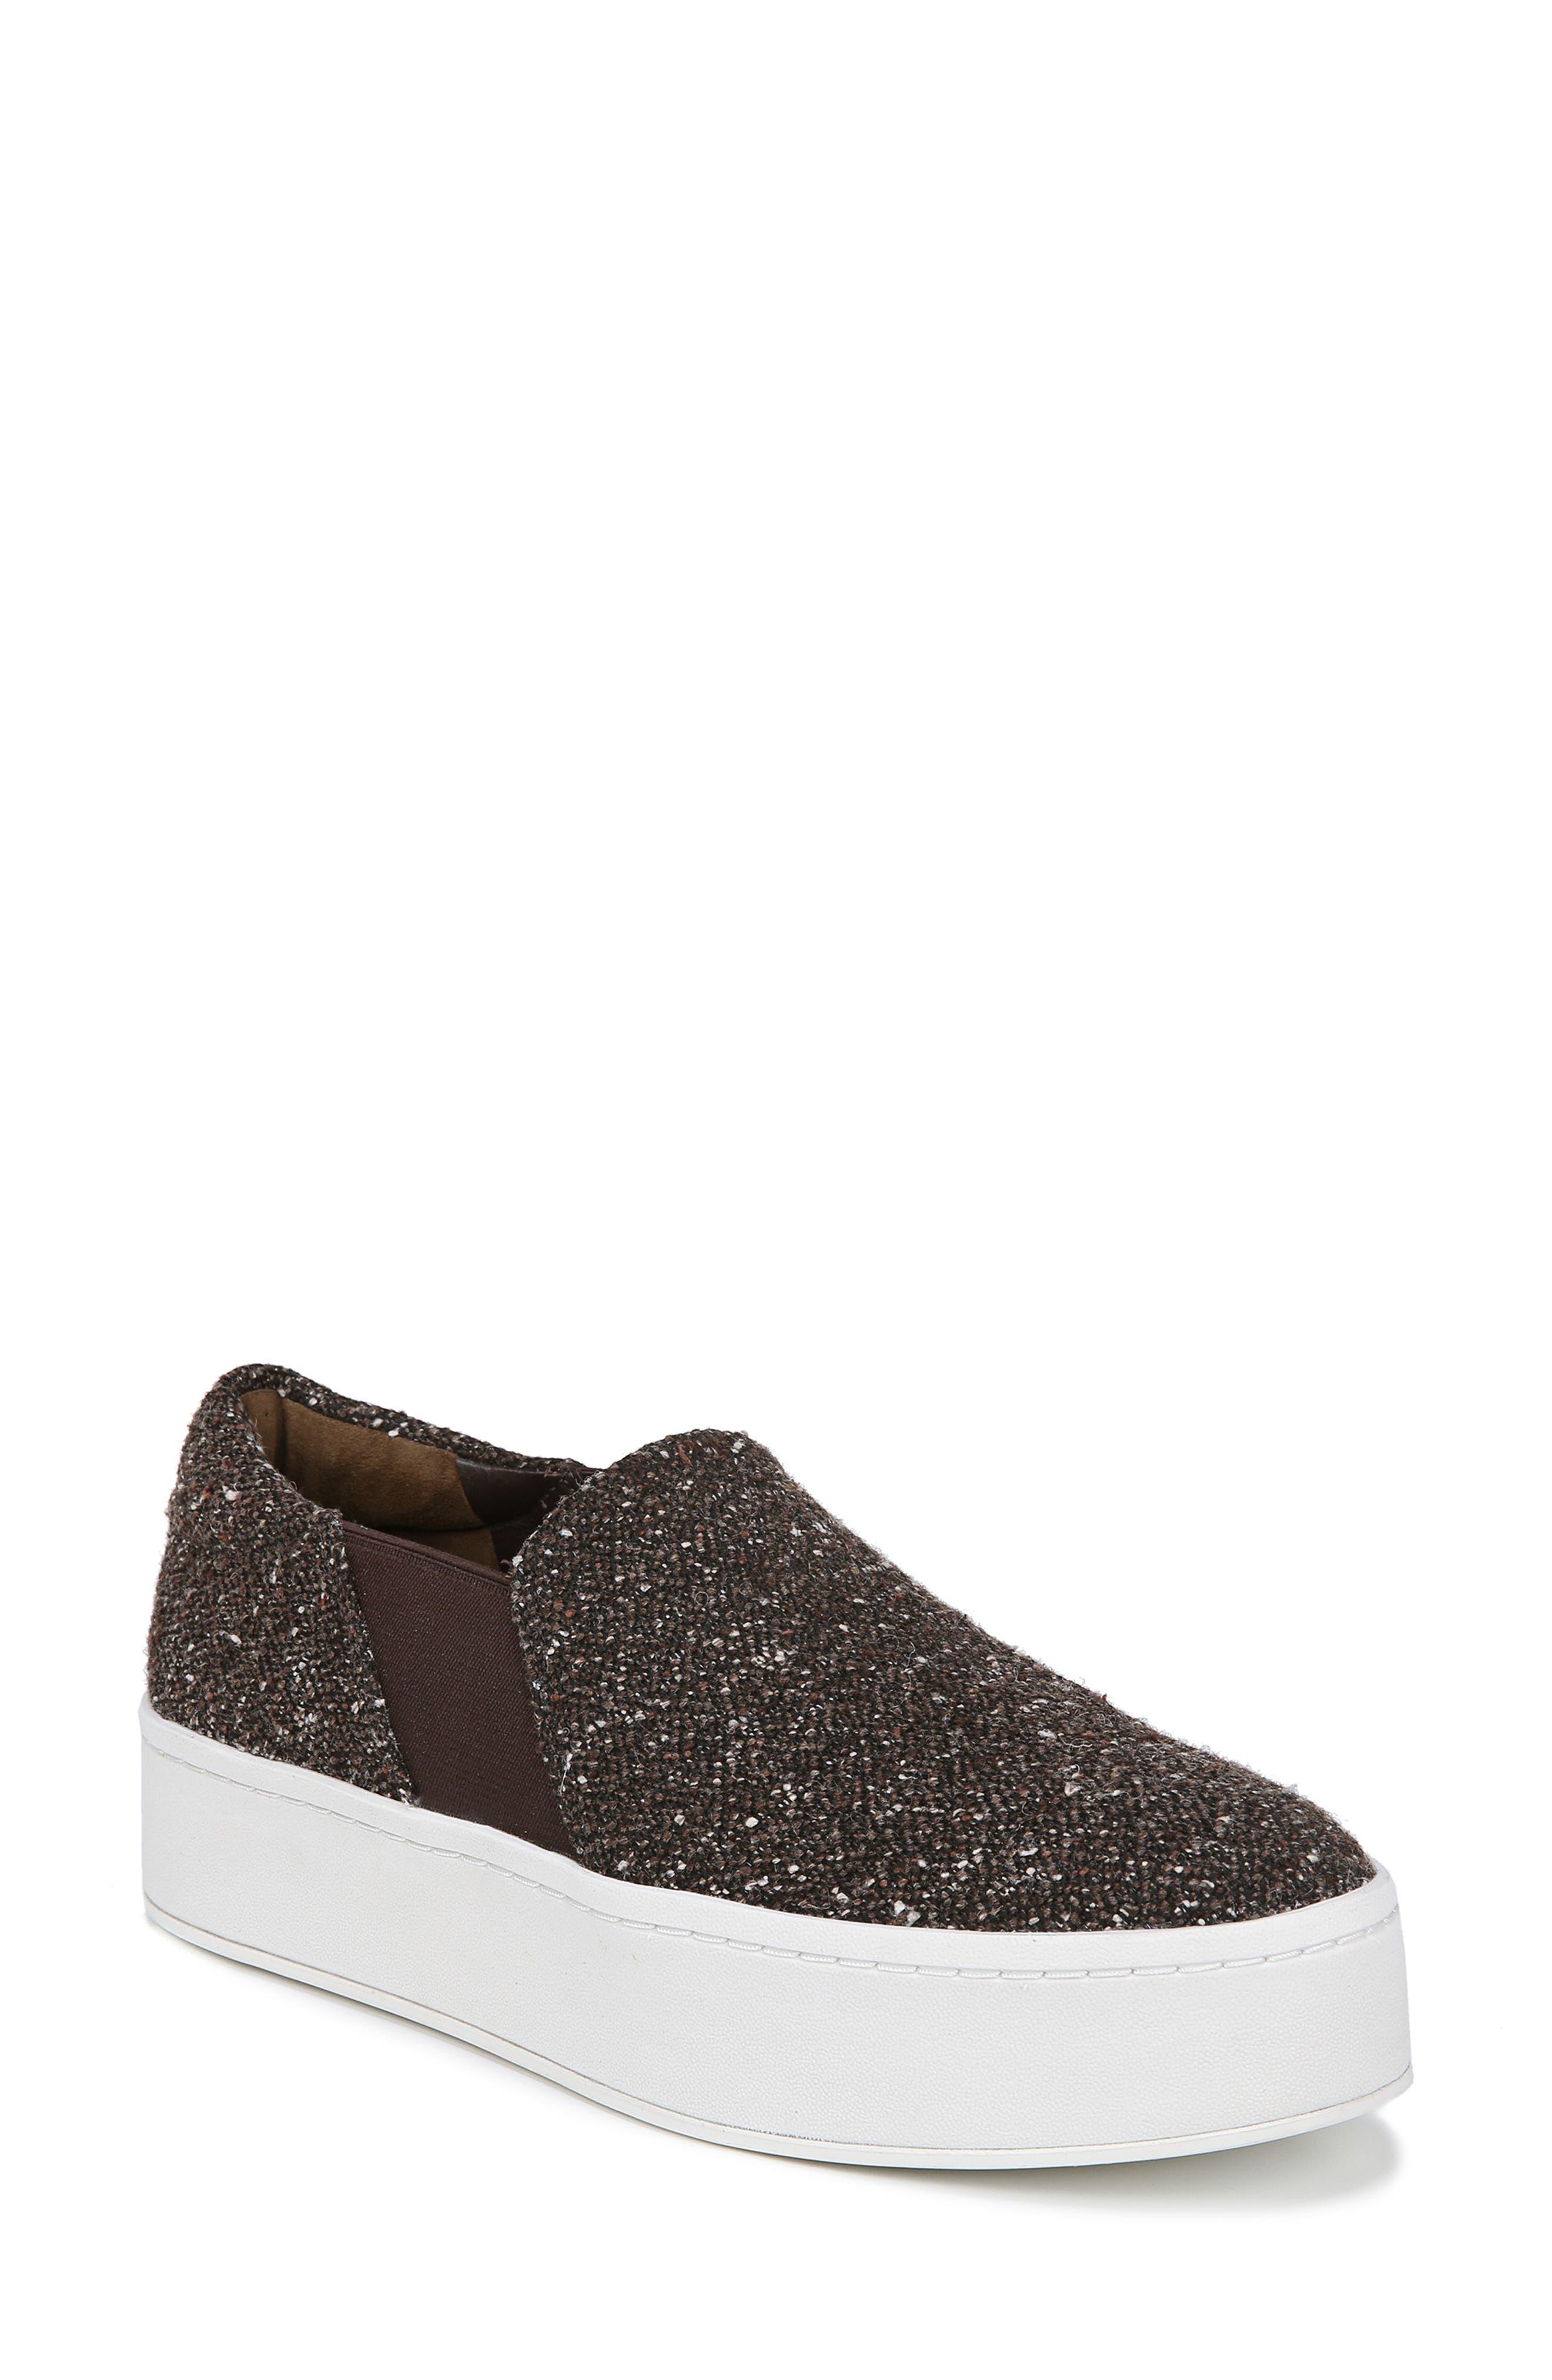 Warren Slip-On Sneaker,                         Main,                         color, UMBER